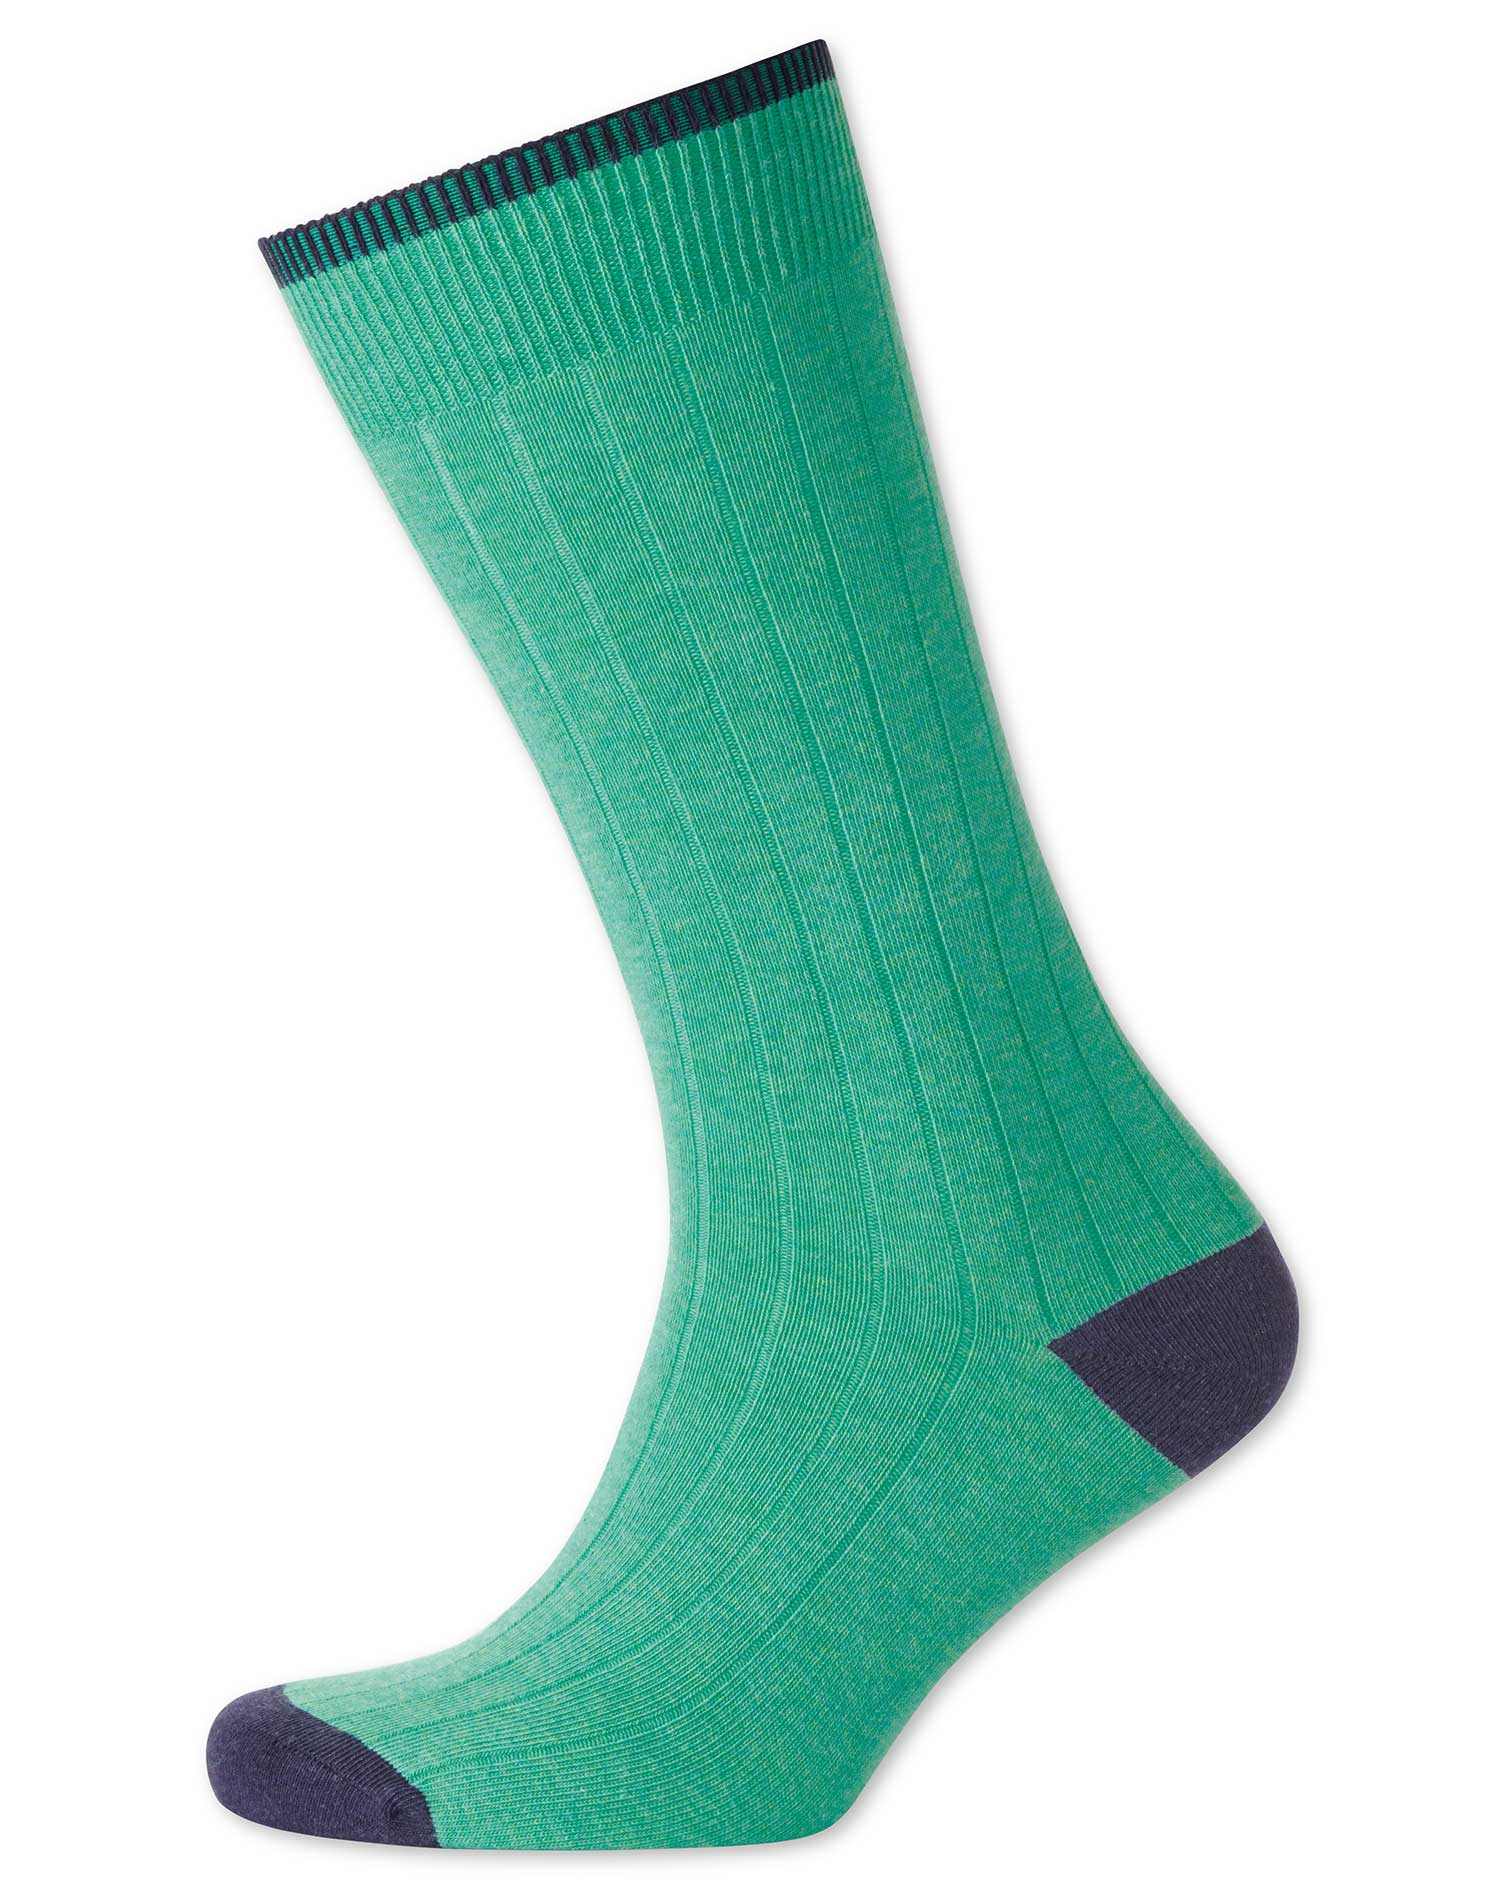 Bright Mint Cotton Rib Socks Size Large by Charles Tyrwhitt